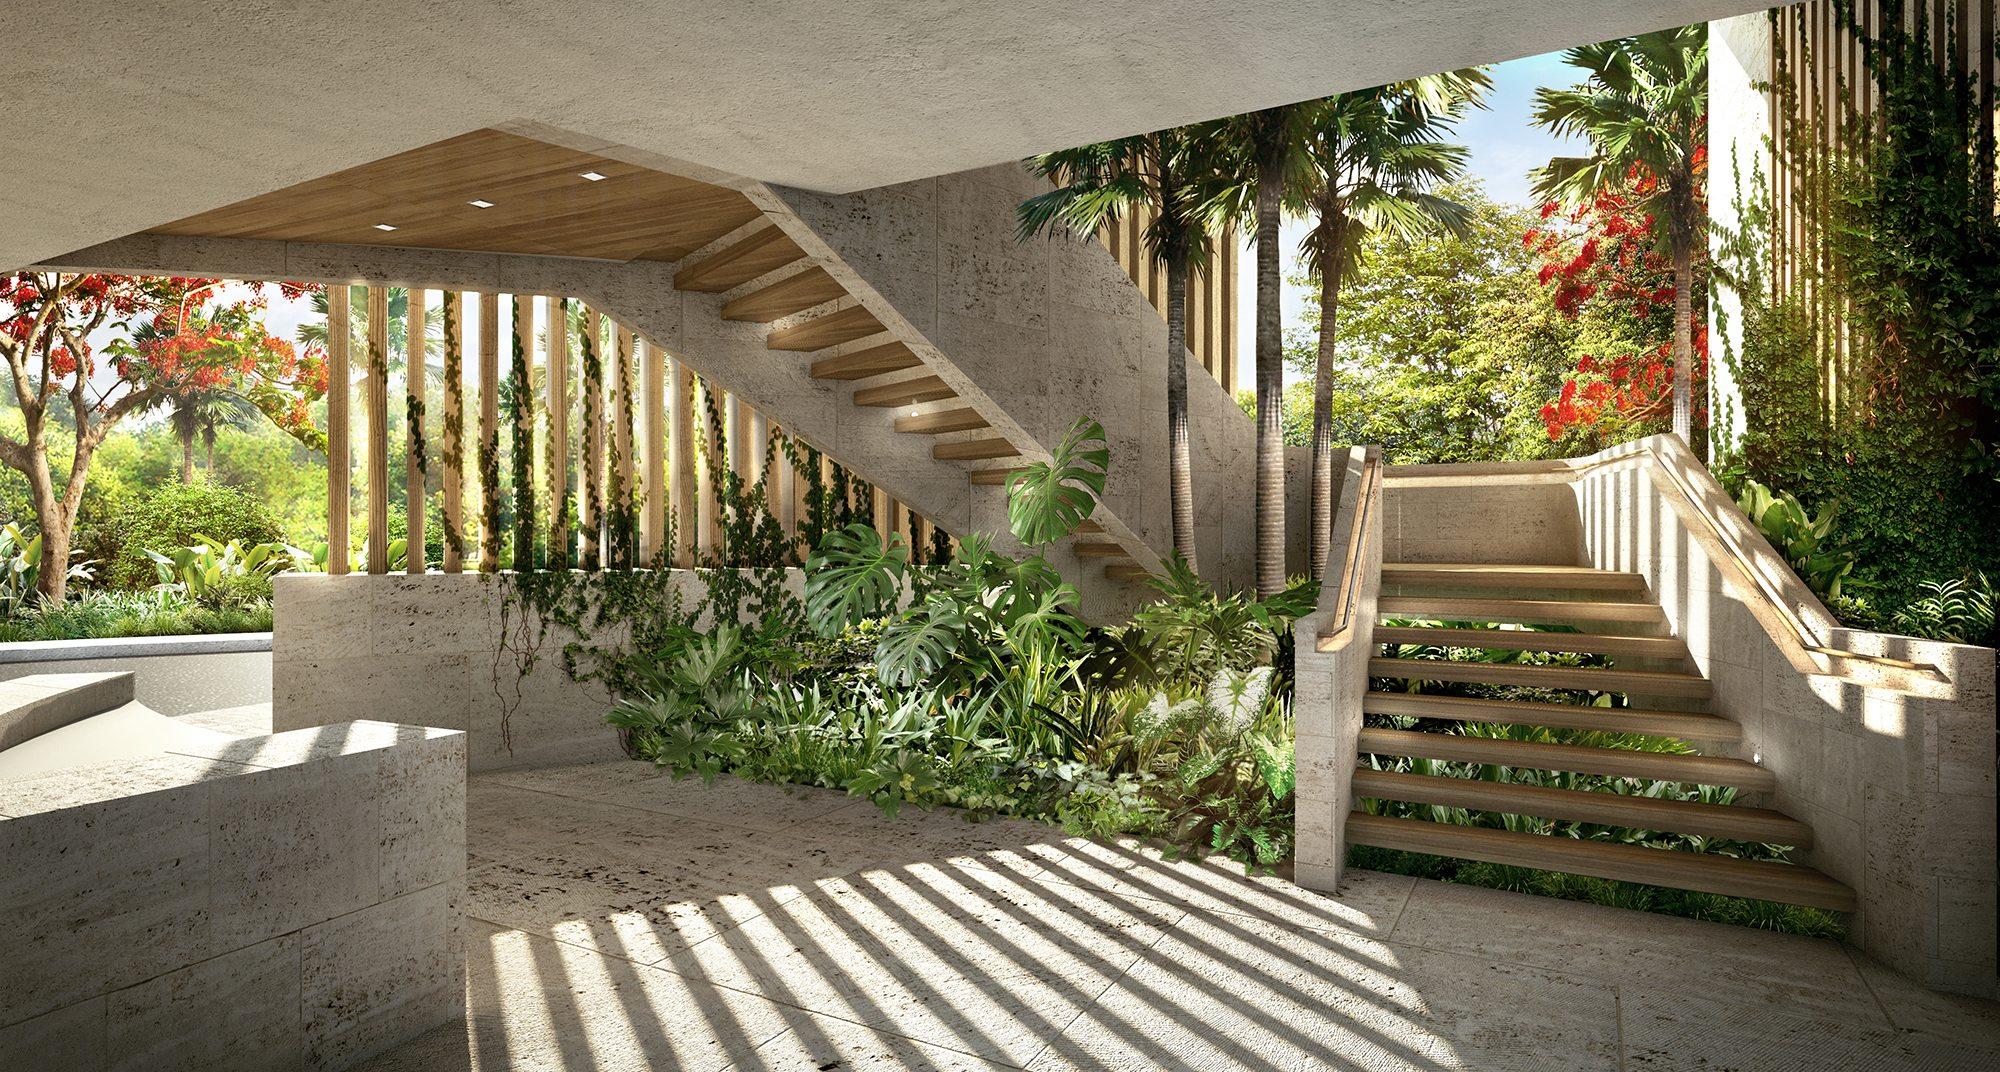 Fairchild Stairs